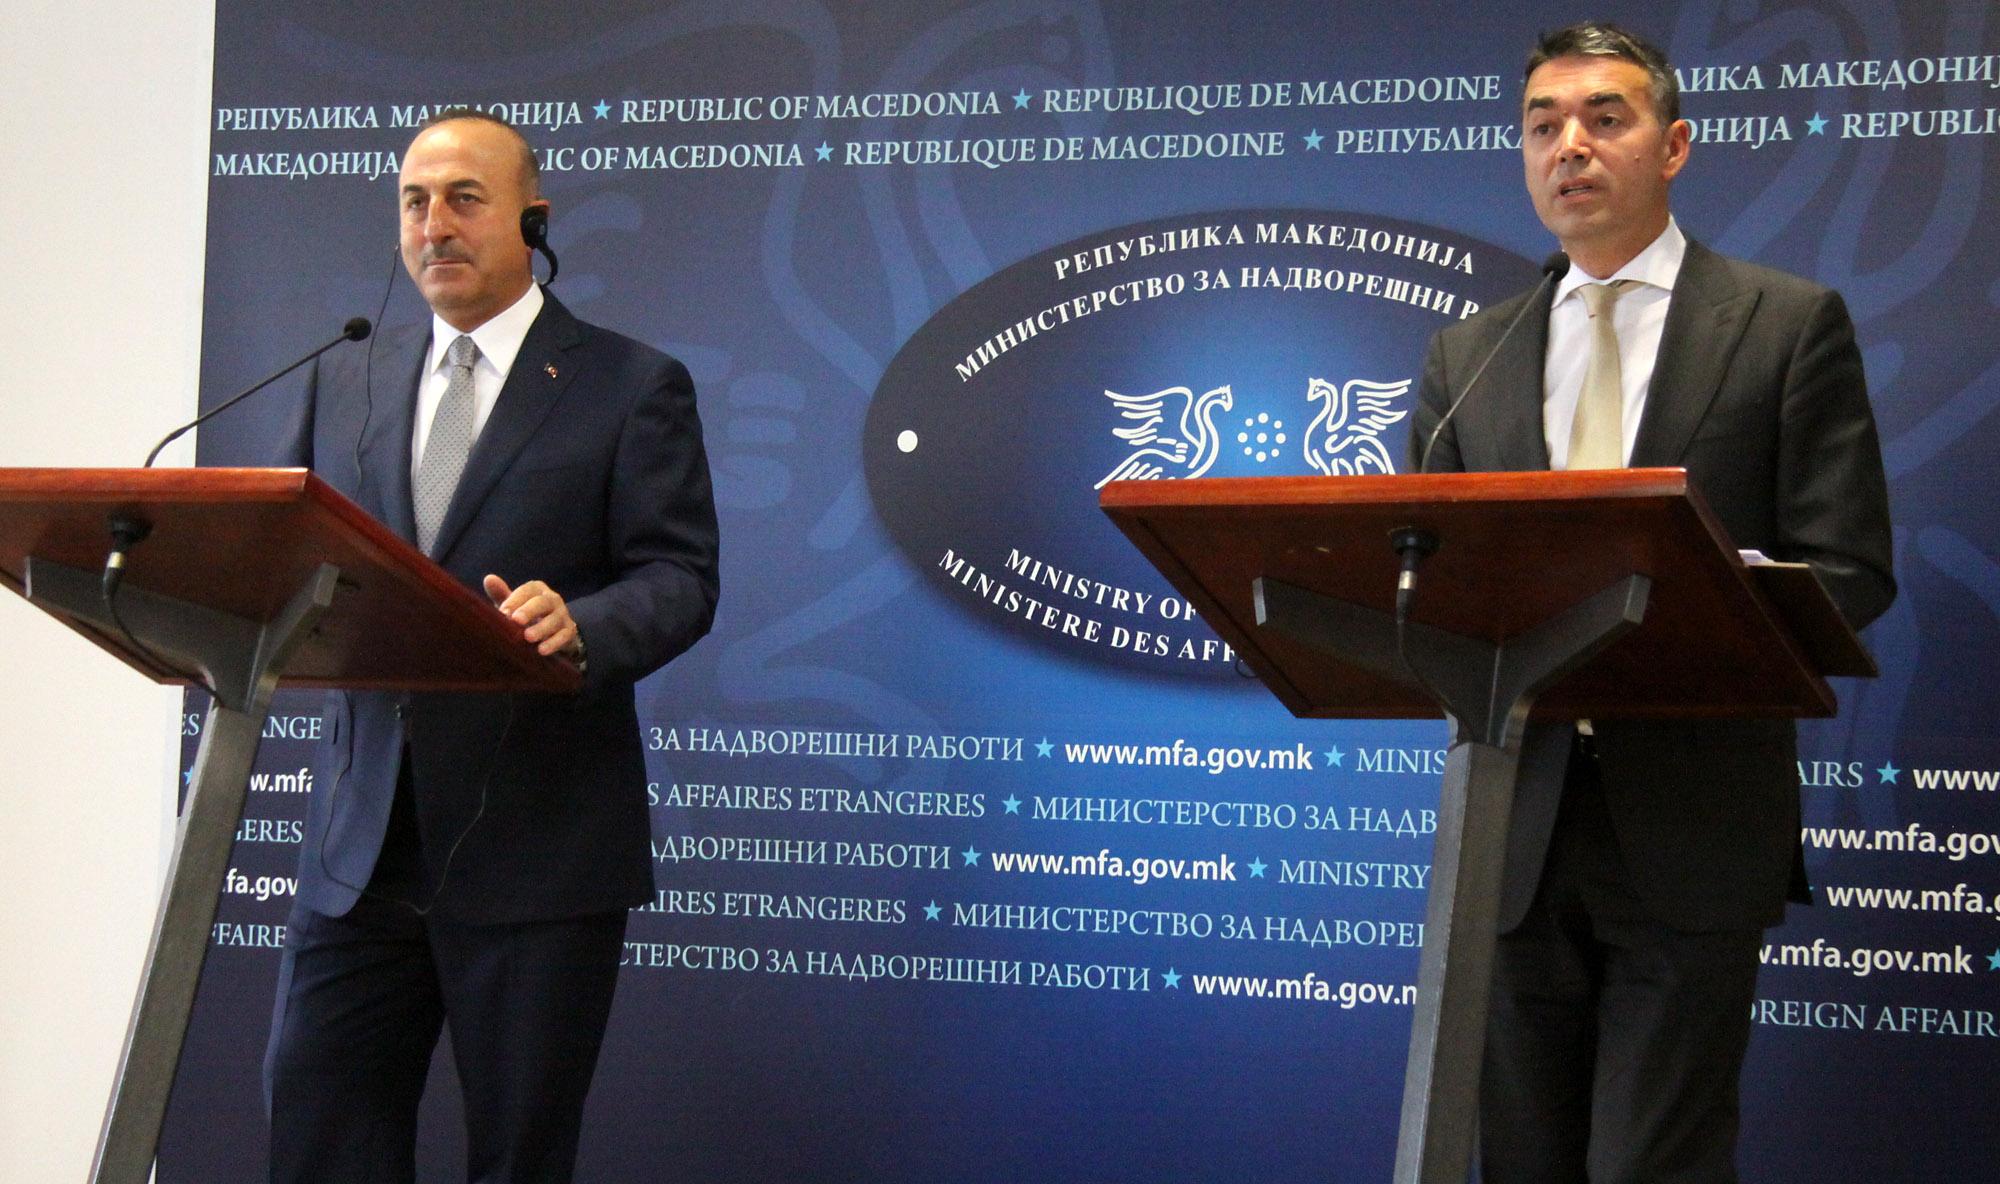 Cavosoglu sends messages of support from Skopje